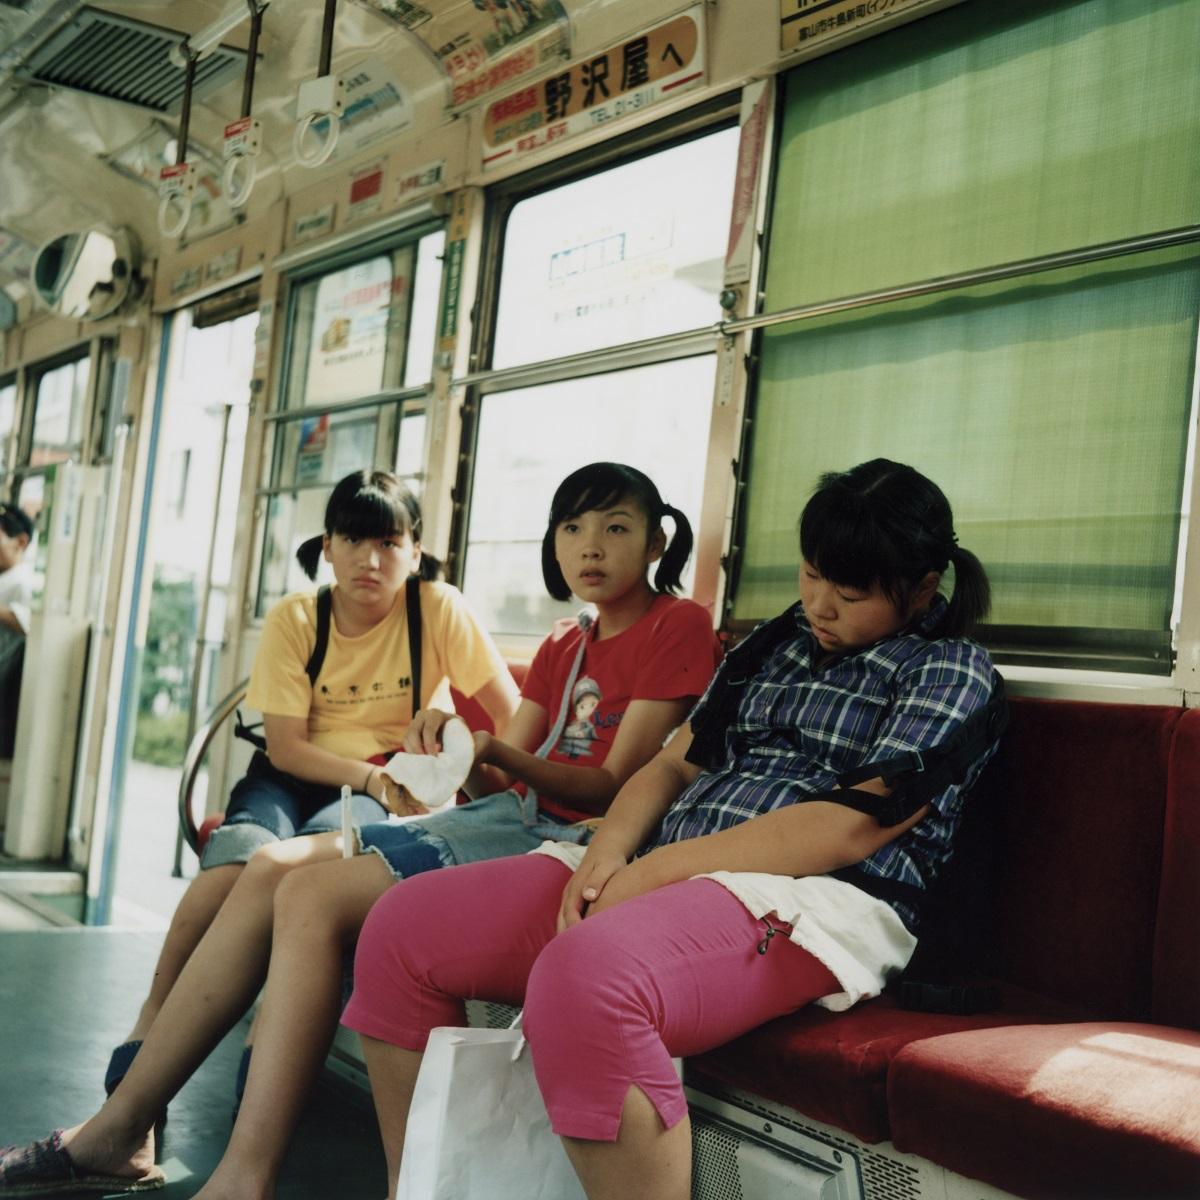 Secret snapshots of Tokyo's vivid street life